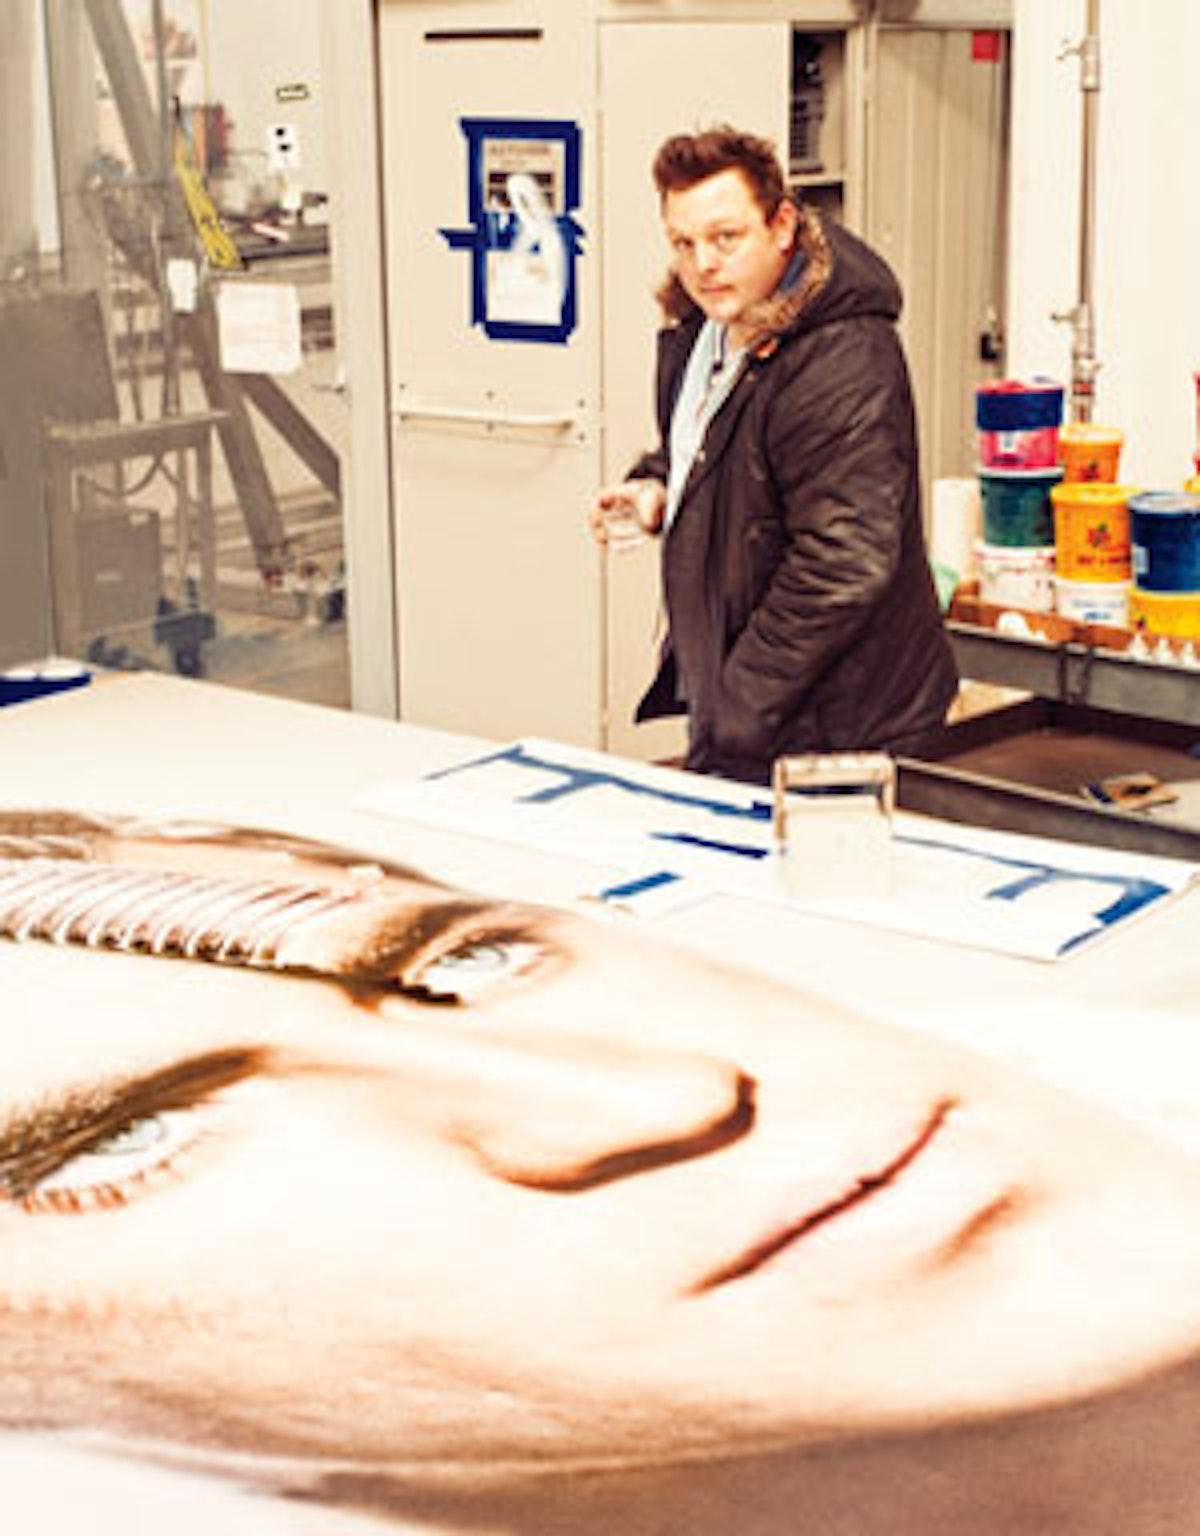 arar-urs-fischer-studio-visit-01-v.jpg